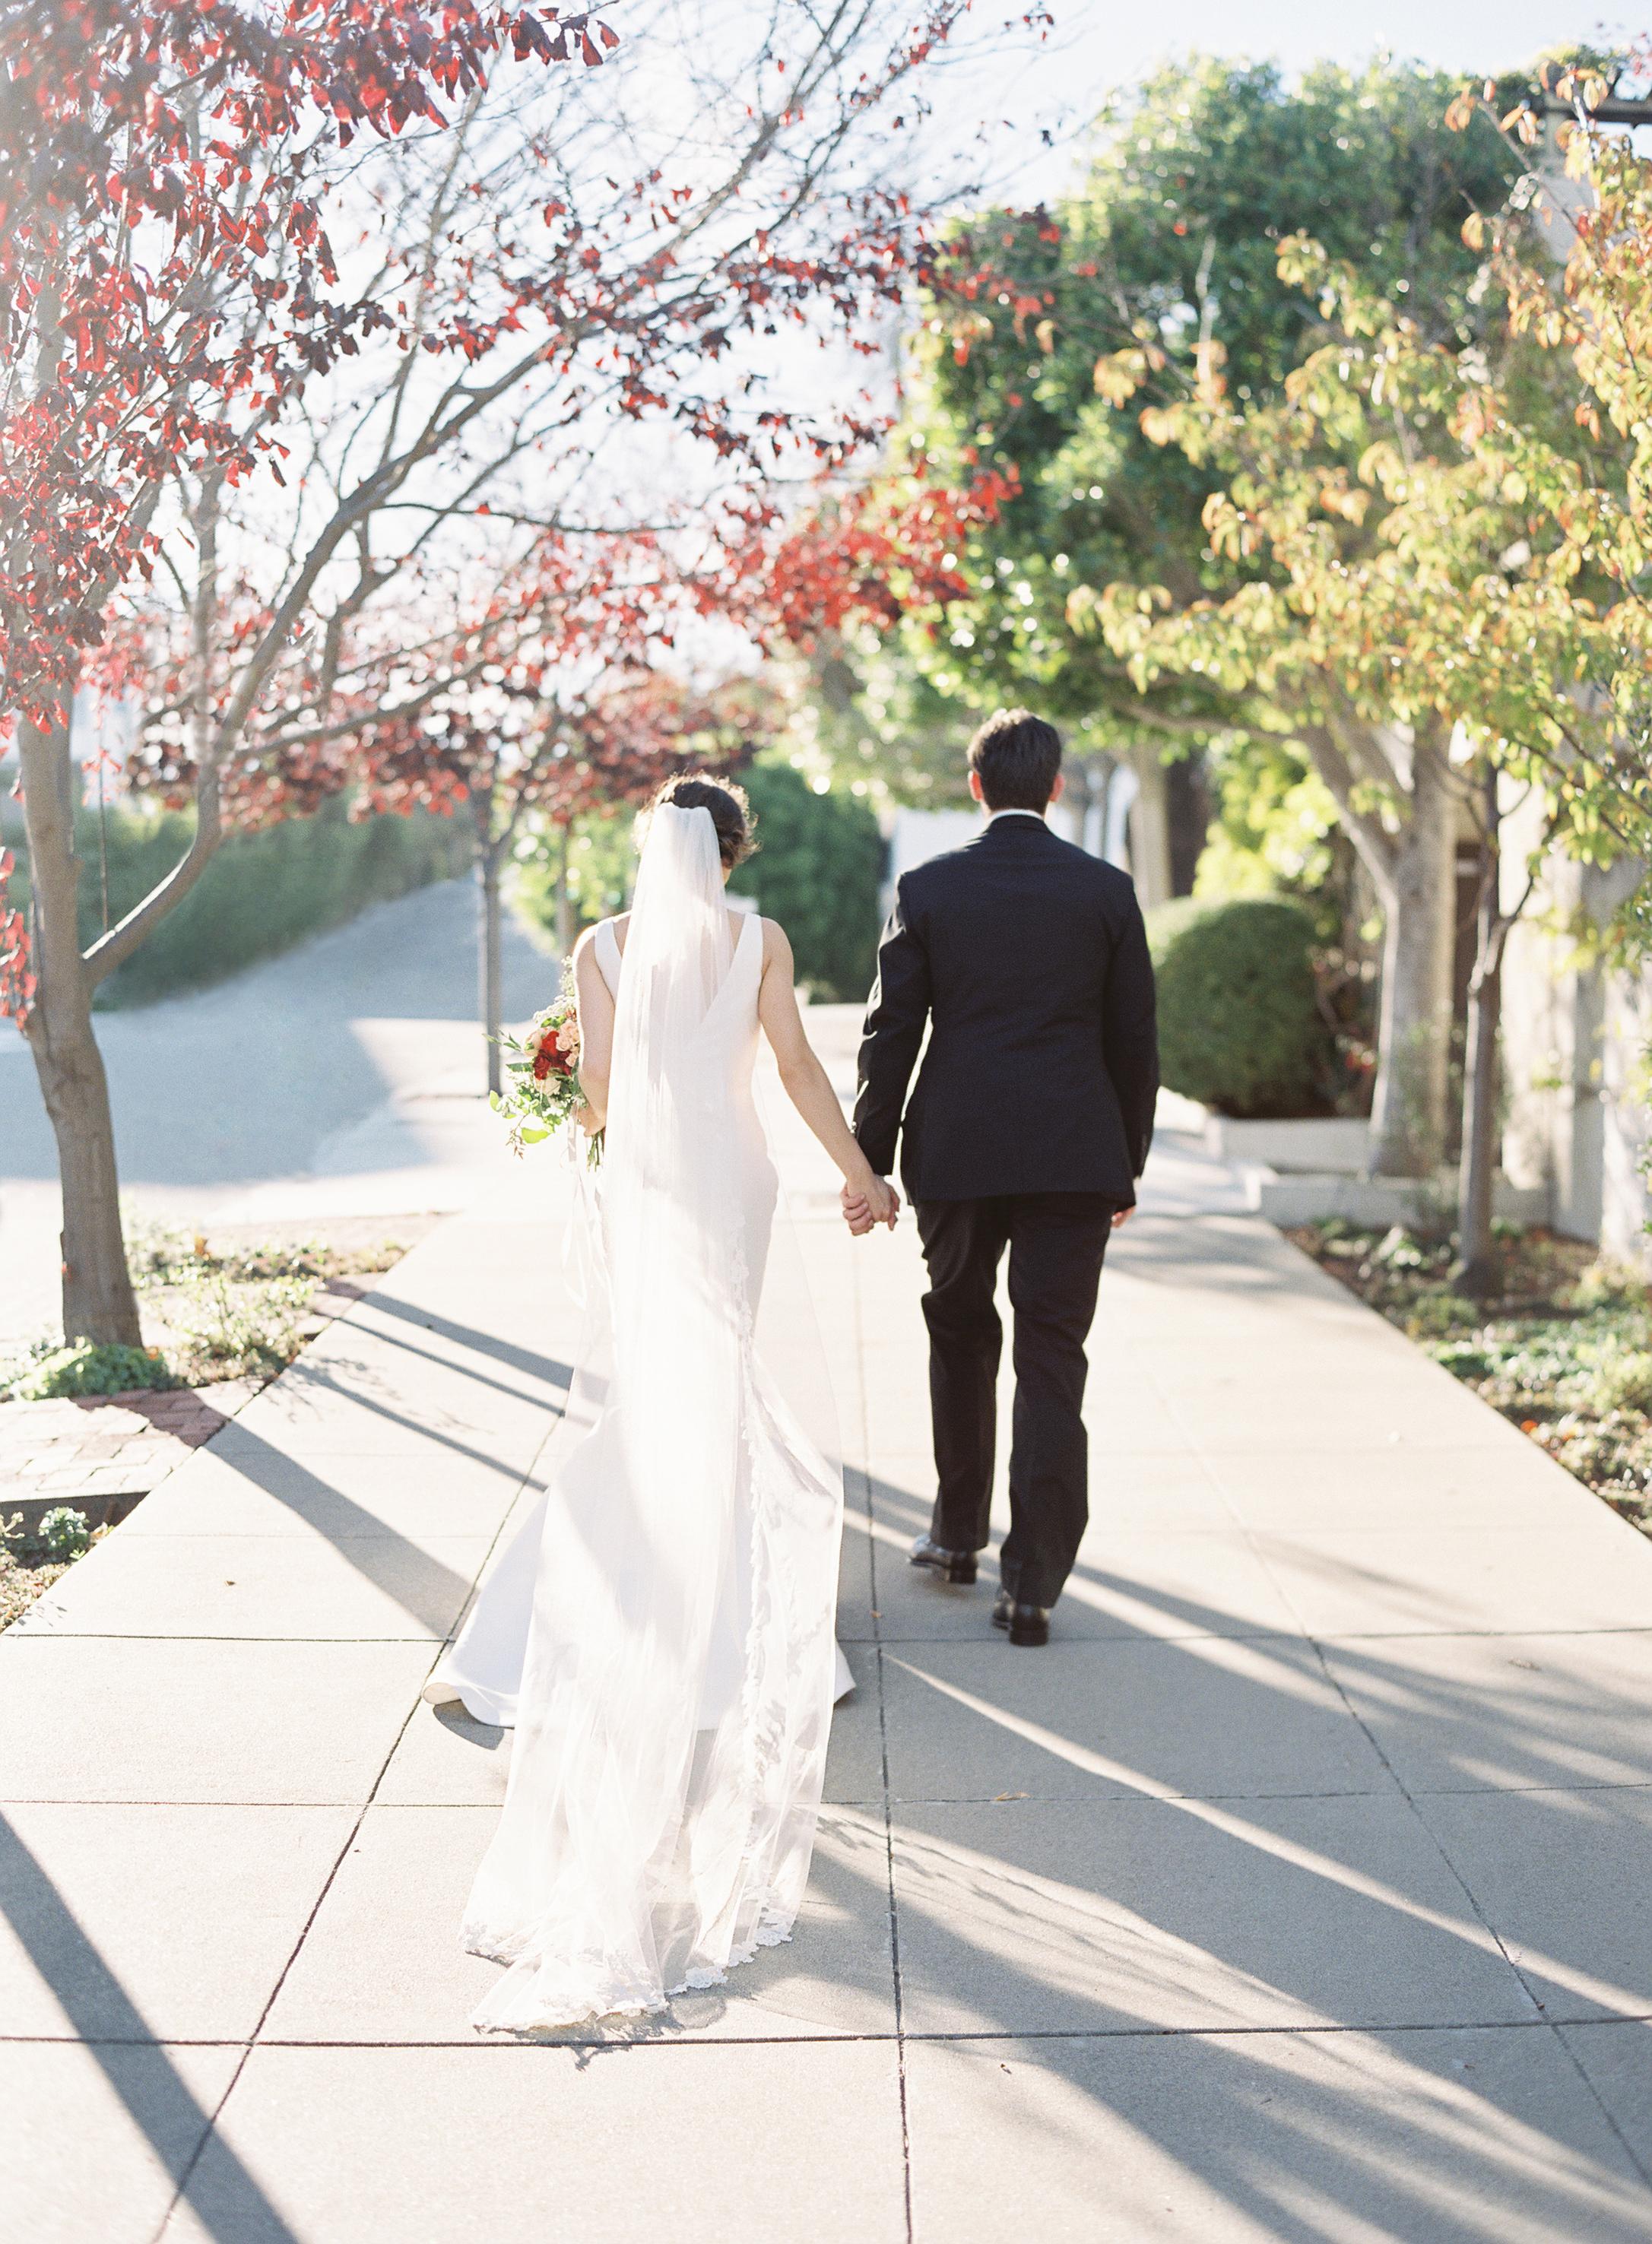 Meghan Mehan Photography - California Wedding Photographer | San Francisco City Hall Wedding 058.jpg